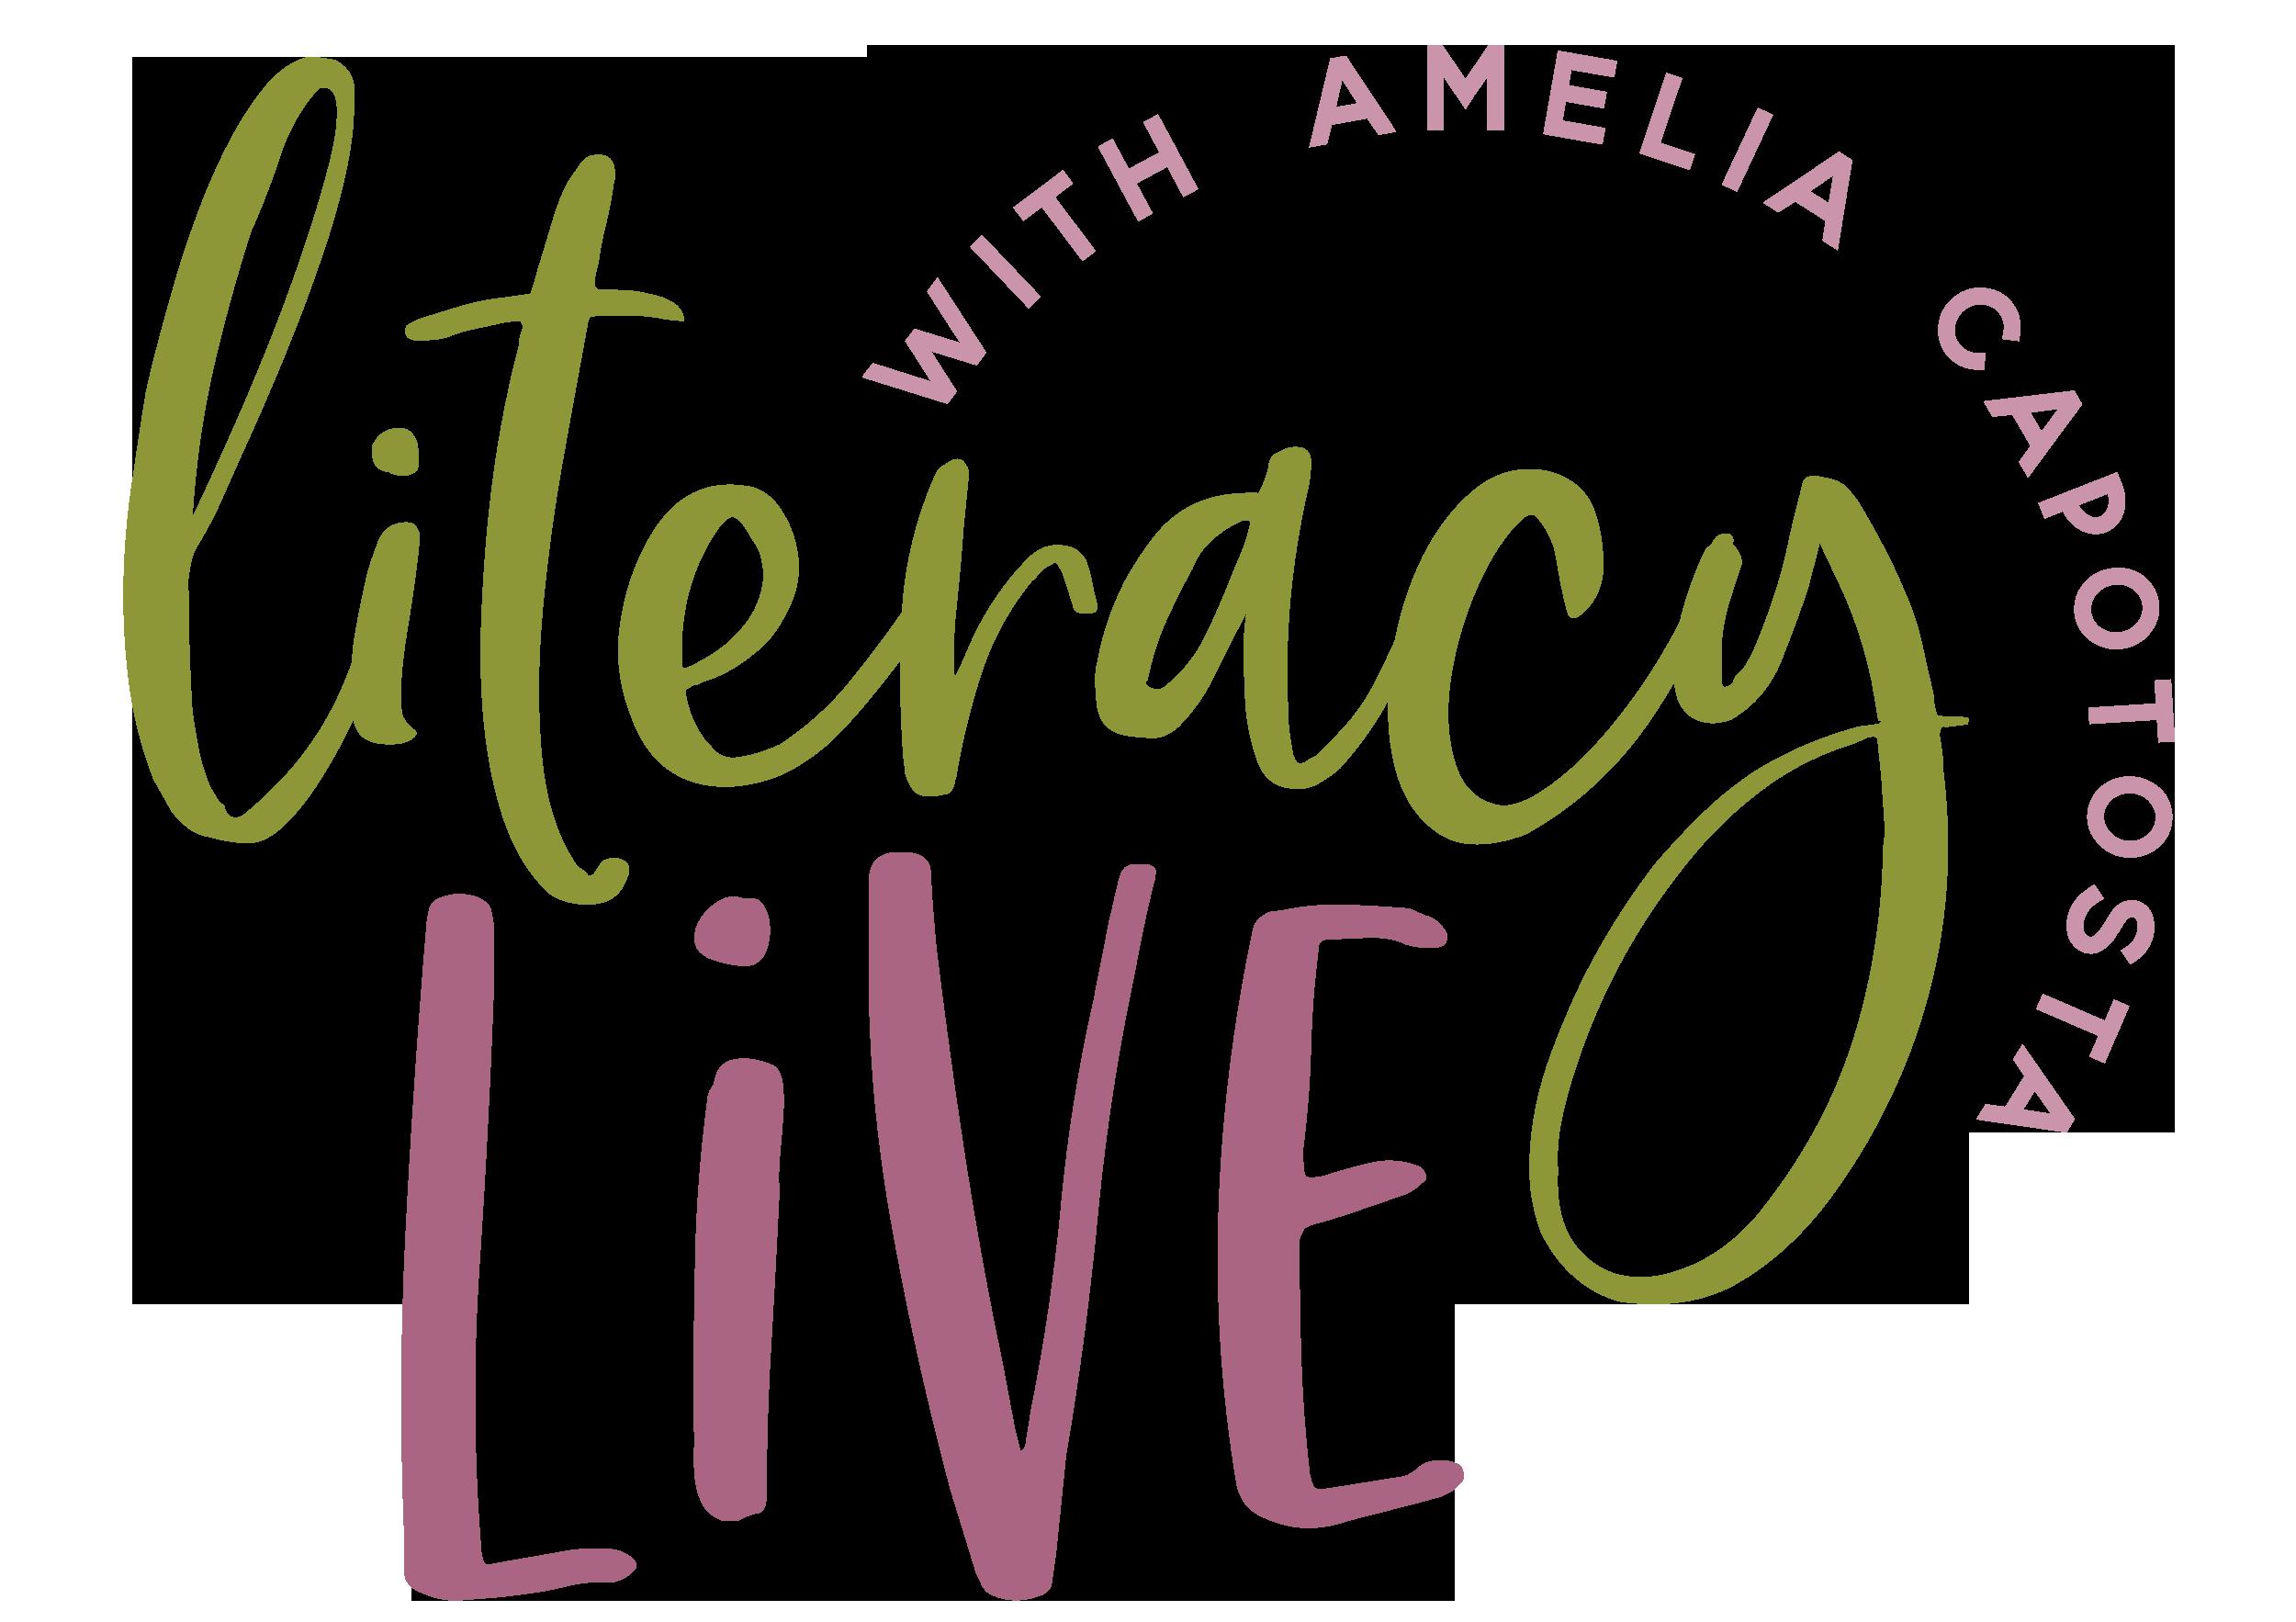 Literacy Live with Amelia